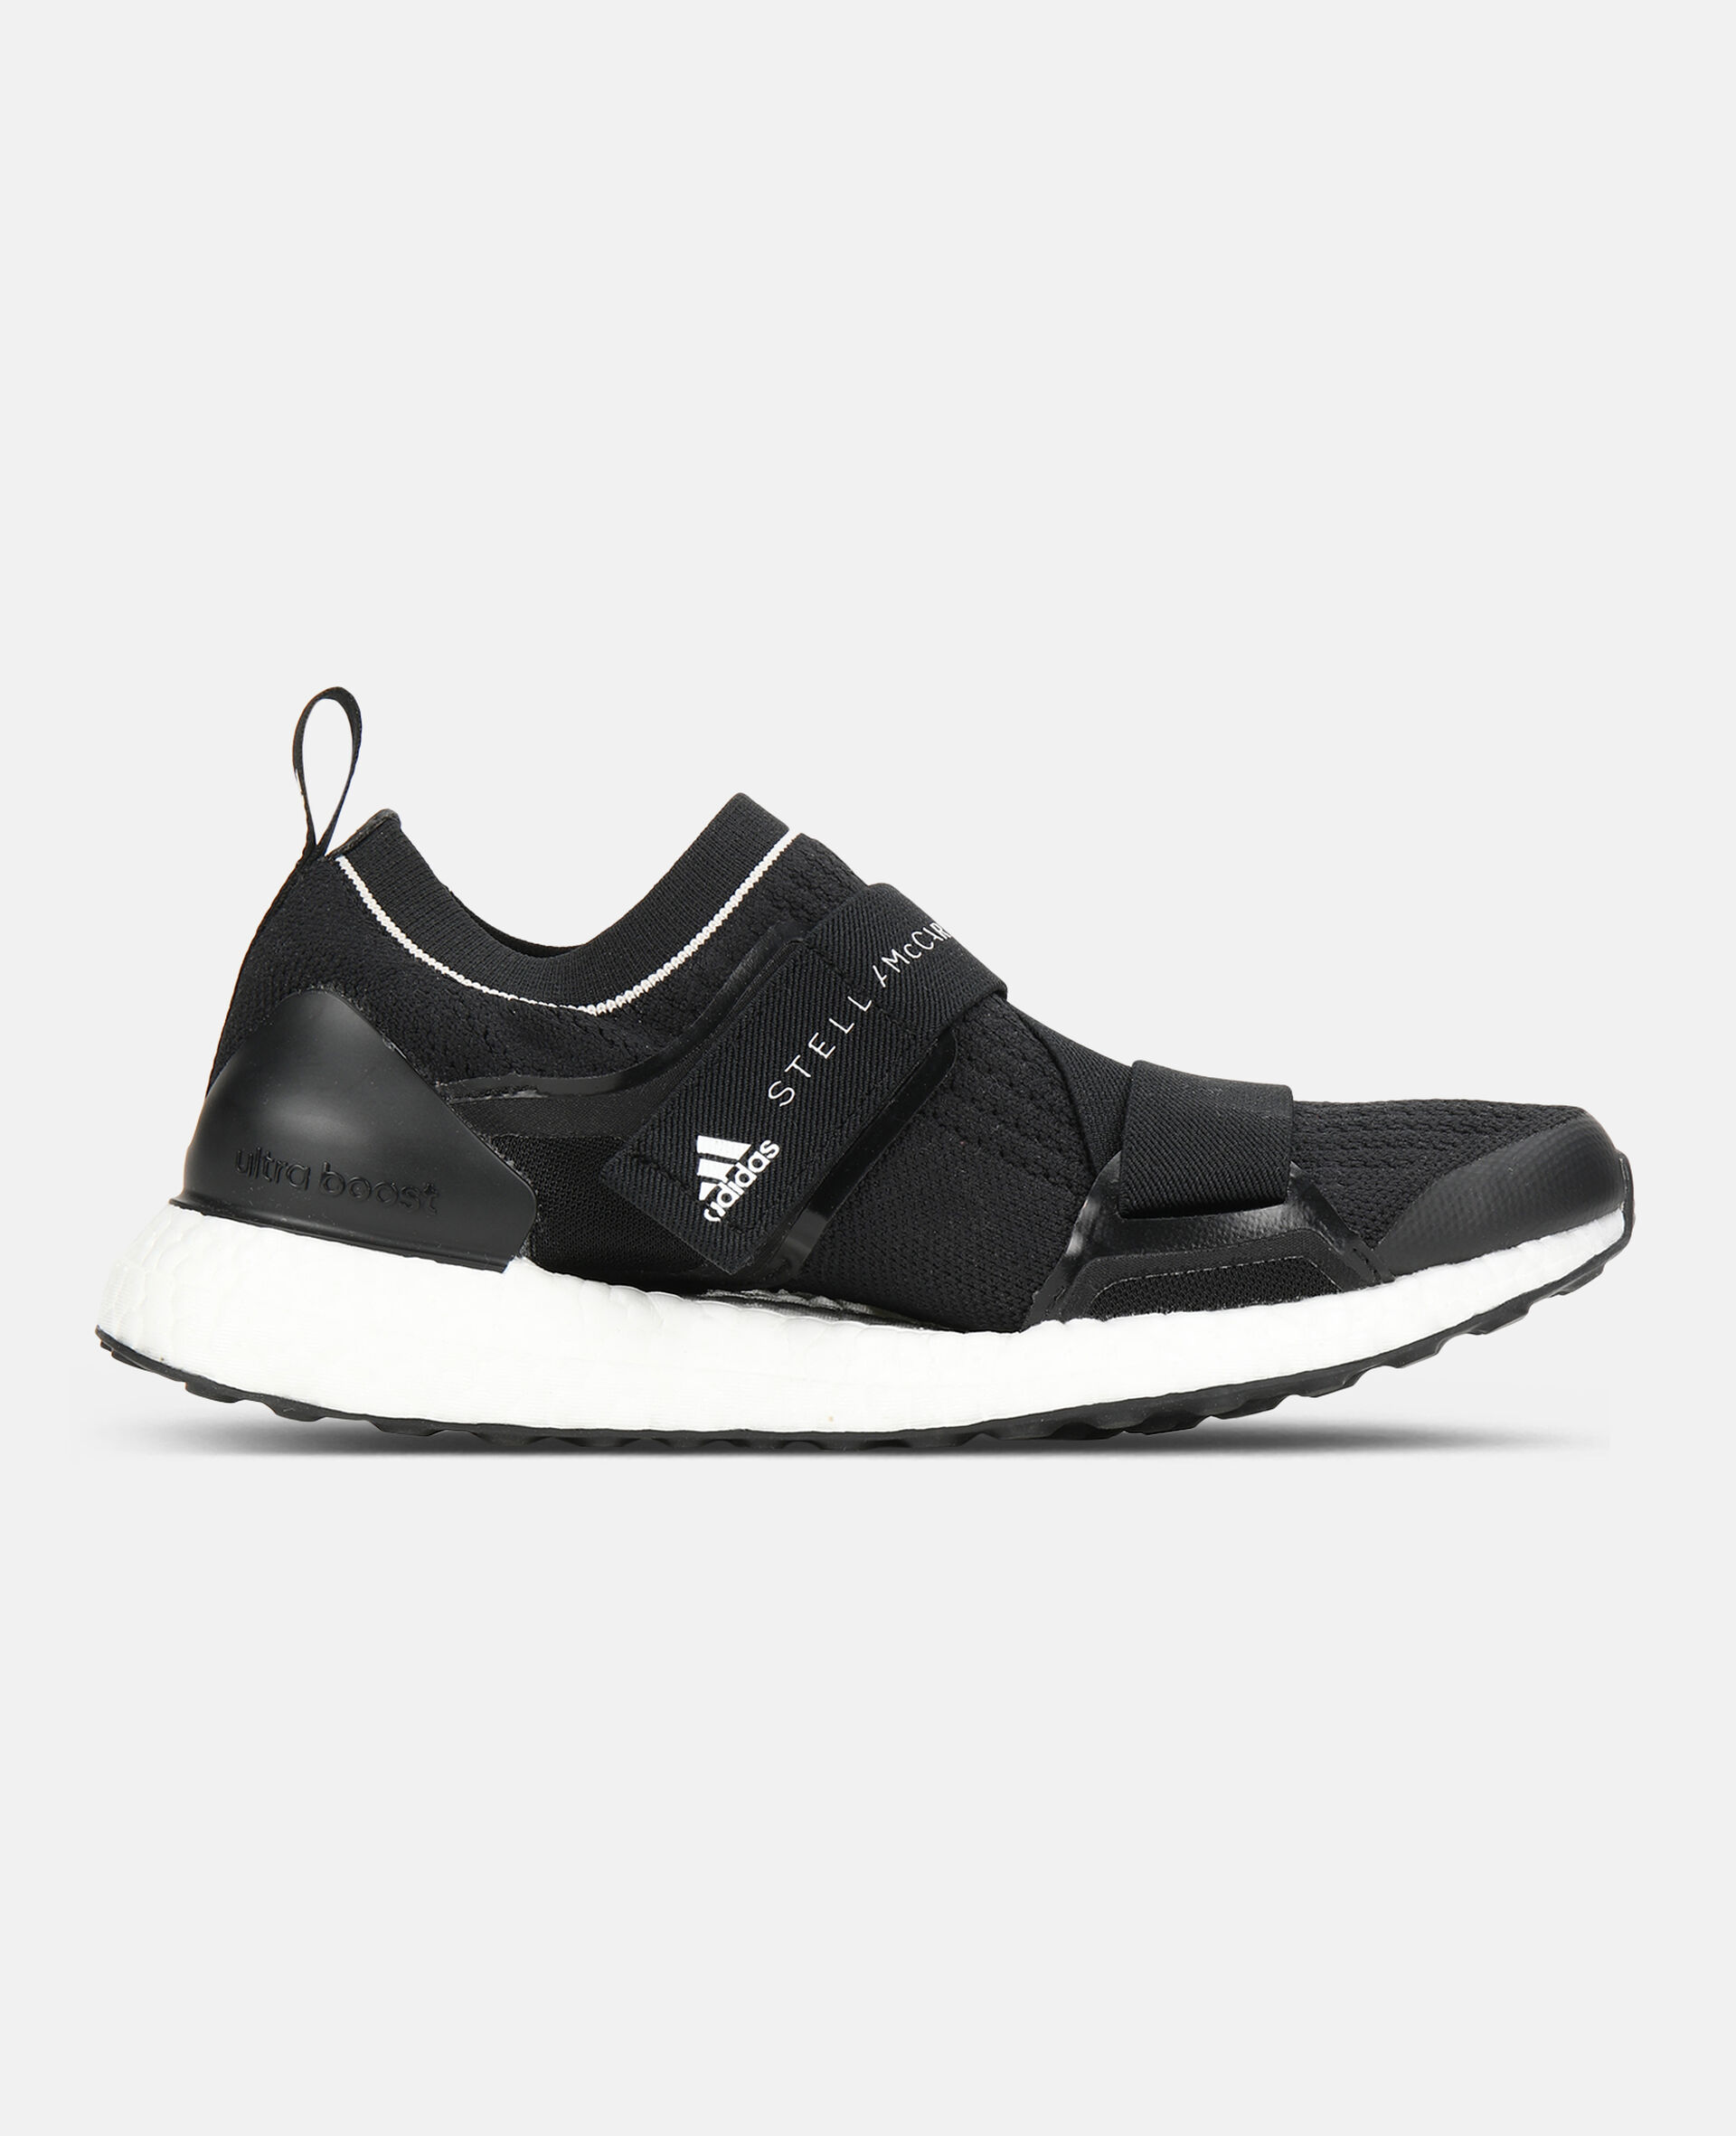 Black Ultraboost X Sneakers-Black-large image number 0